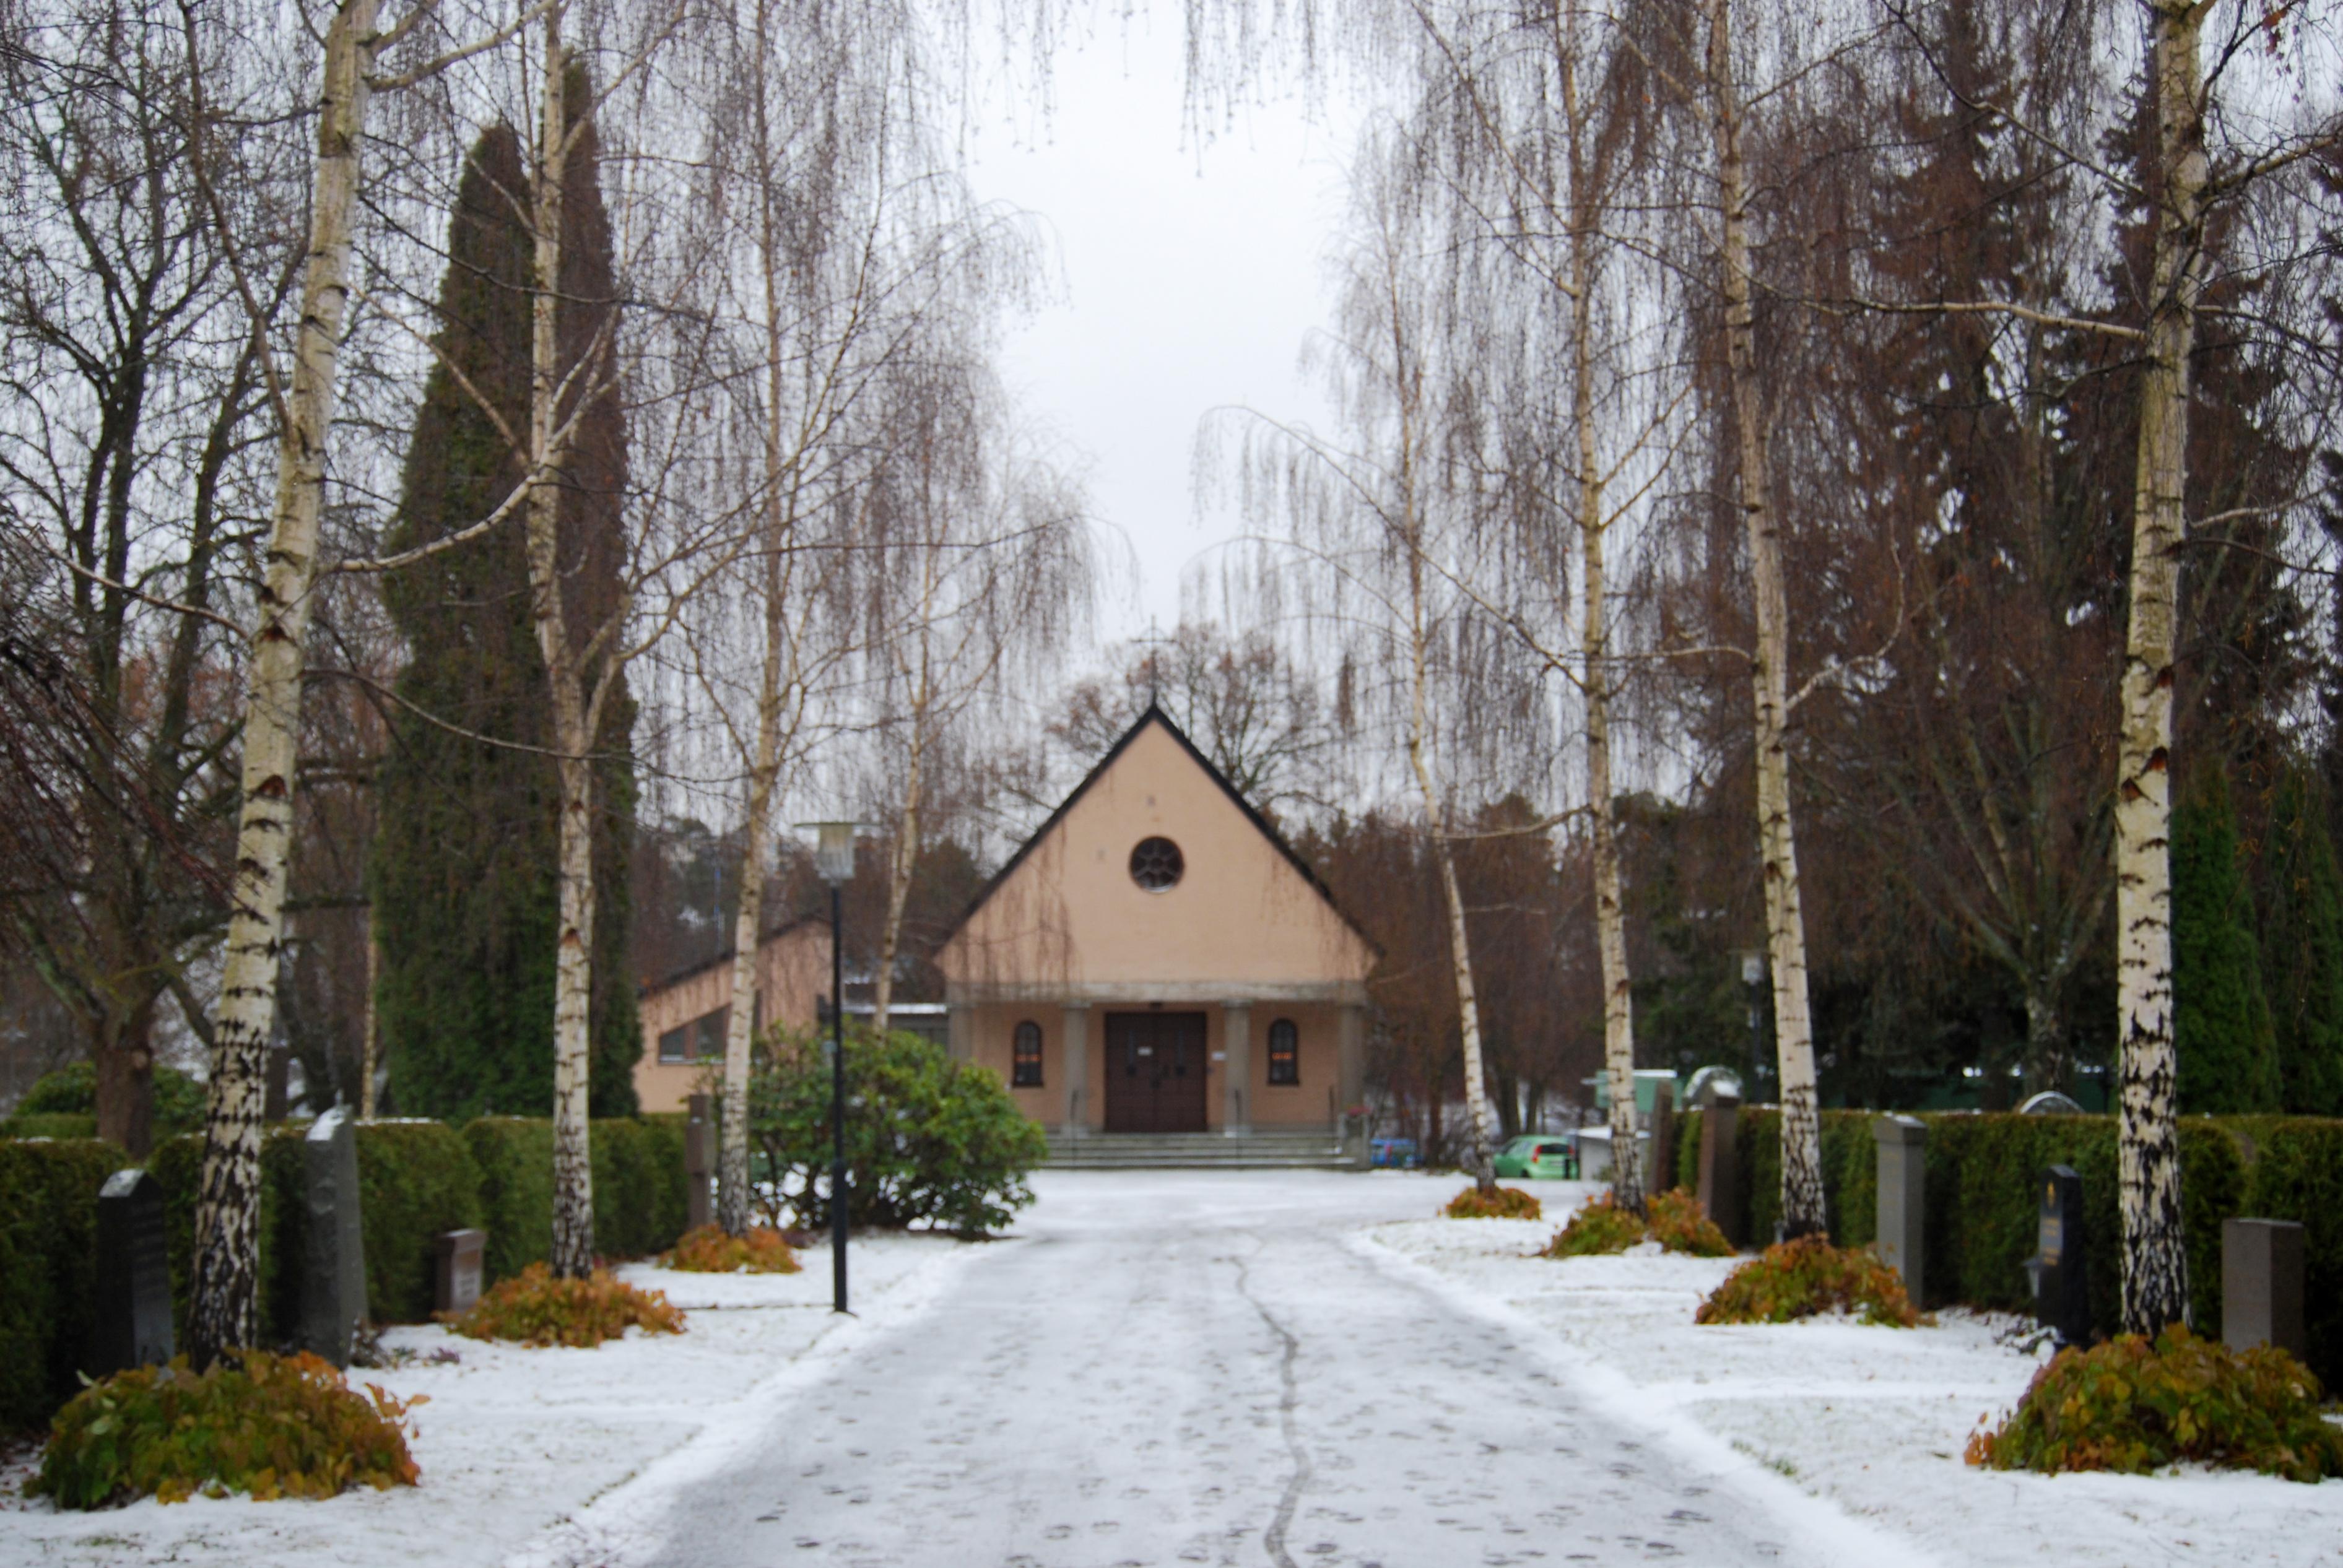 Sundbybergs_begravningsplats_fixx